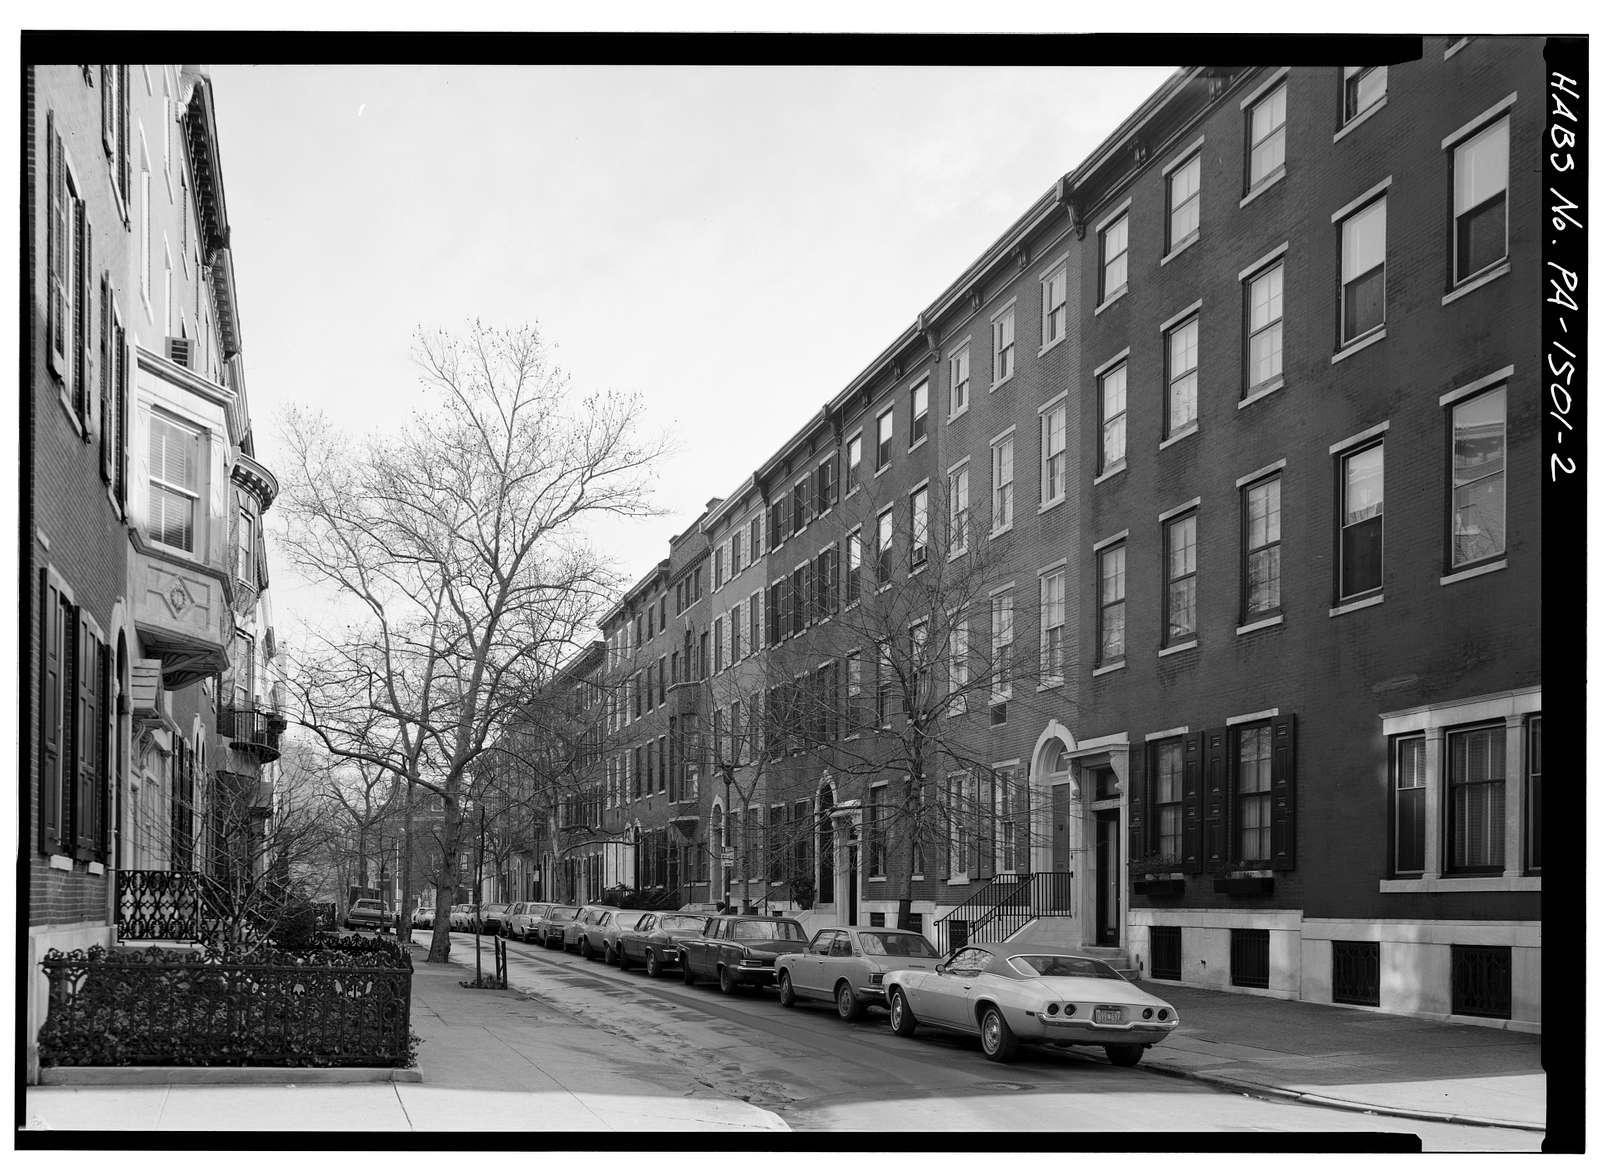 Delancey Street Area Study I, 1800-1836 Delancey Street (Houses), Philadelphia, Philadelphia County, PA